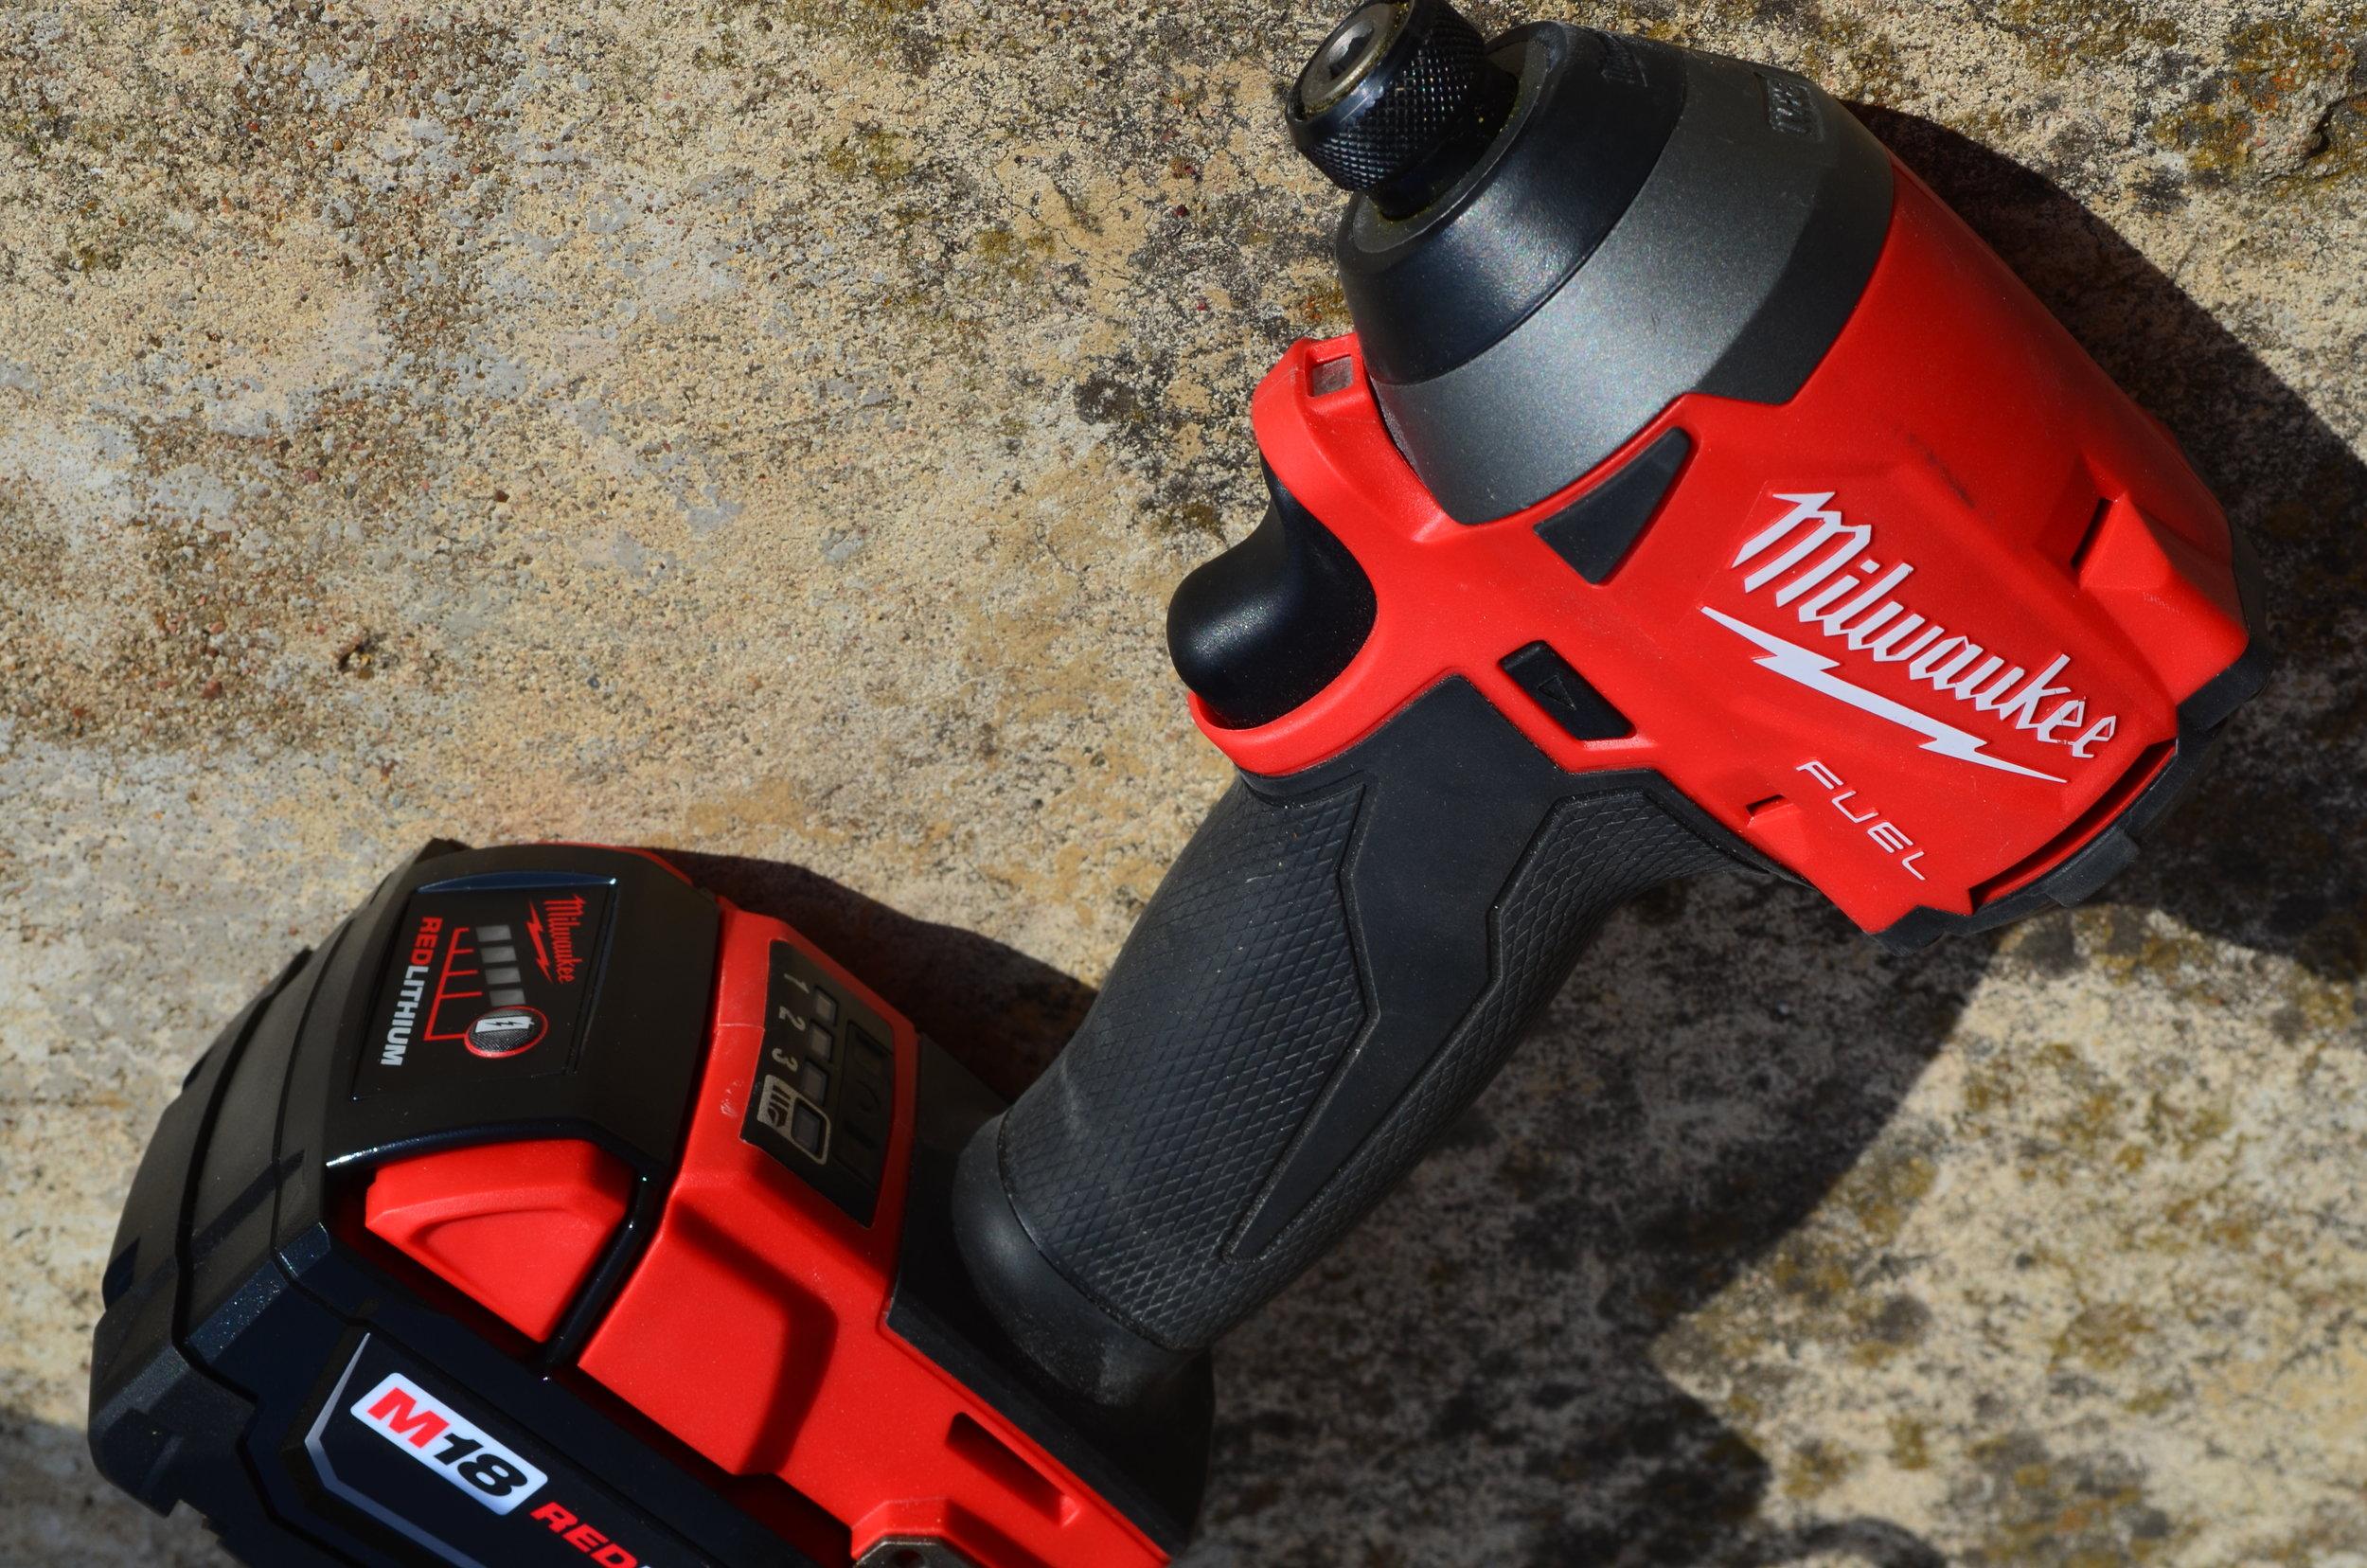 18v-fuel-milwaukee-brushless-combo-hammer-drill-impact-driver